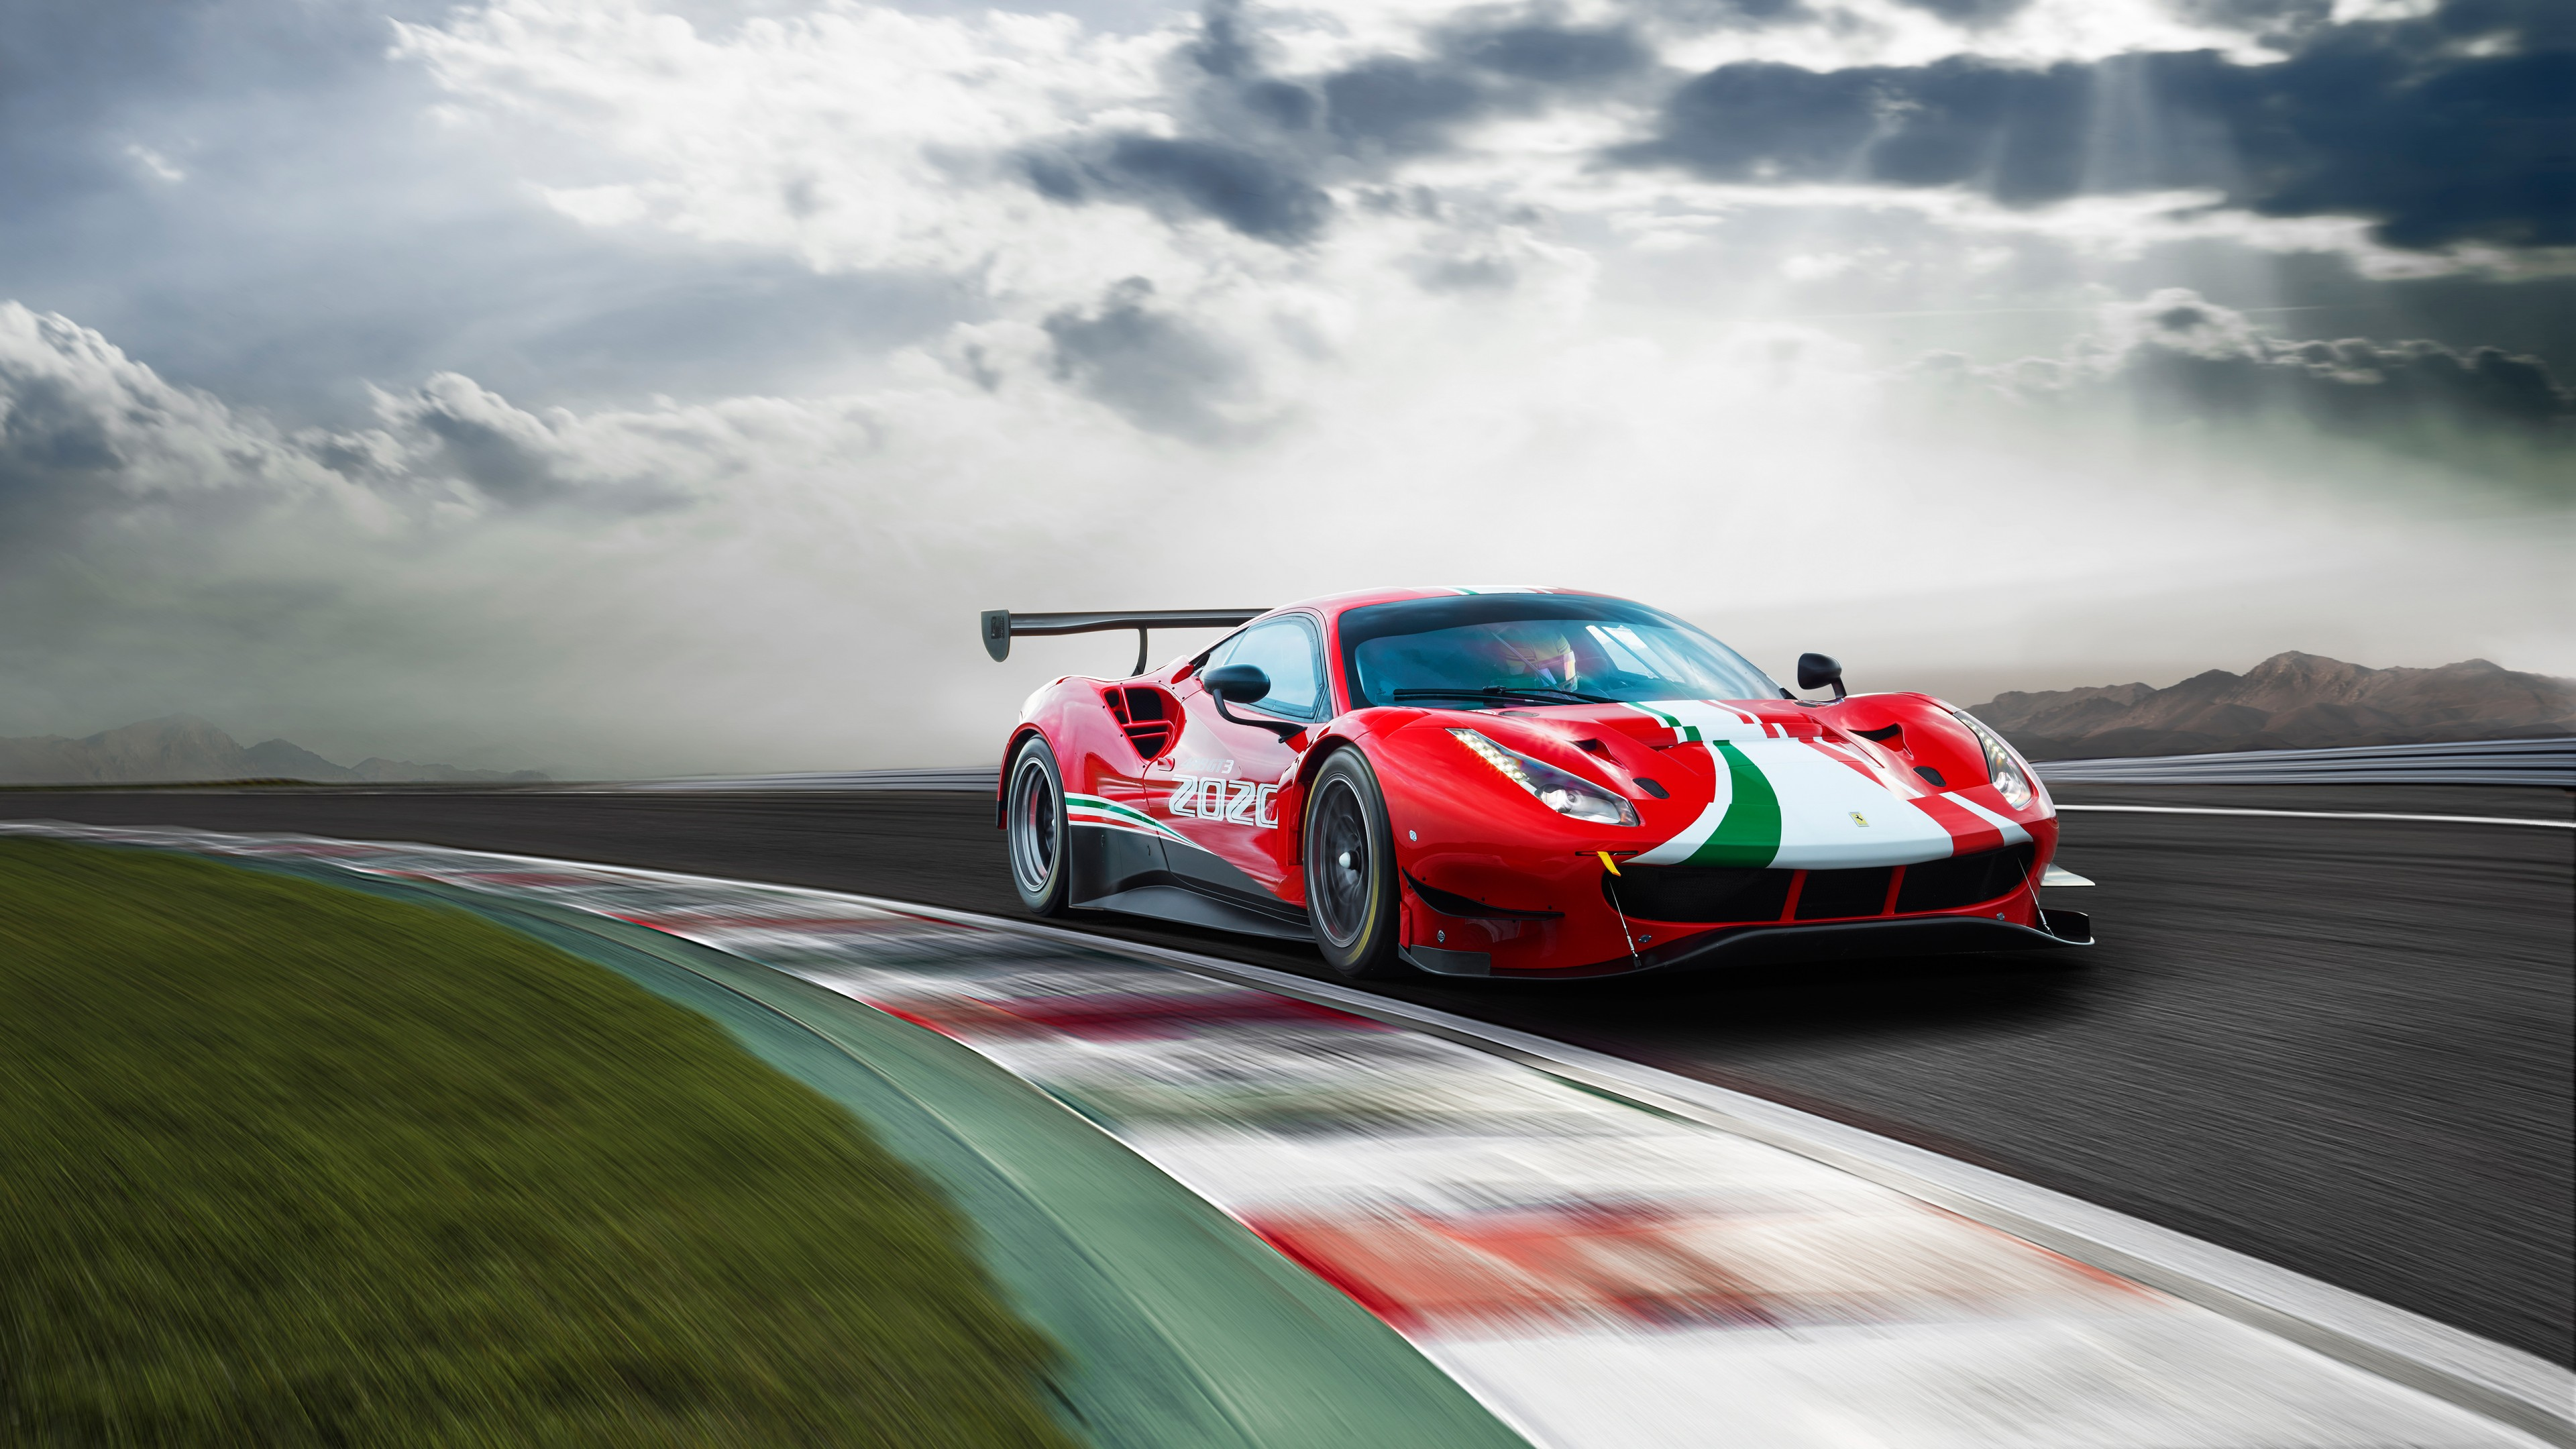 Ferrari 488 GT3 Evo 2020 Racing Wallpaper | HD Car Wallpapers | ID #13545